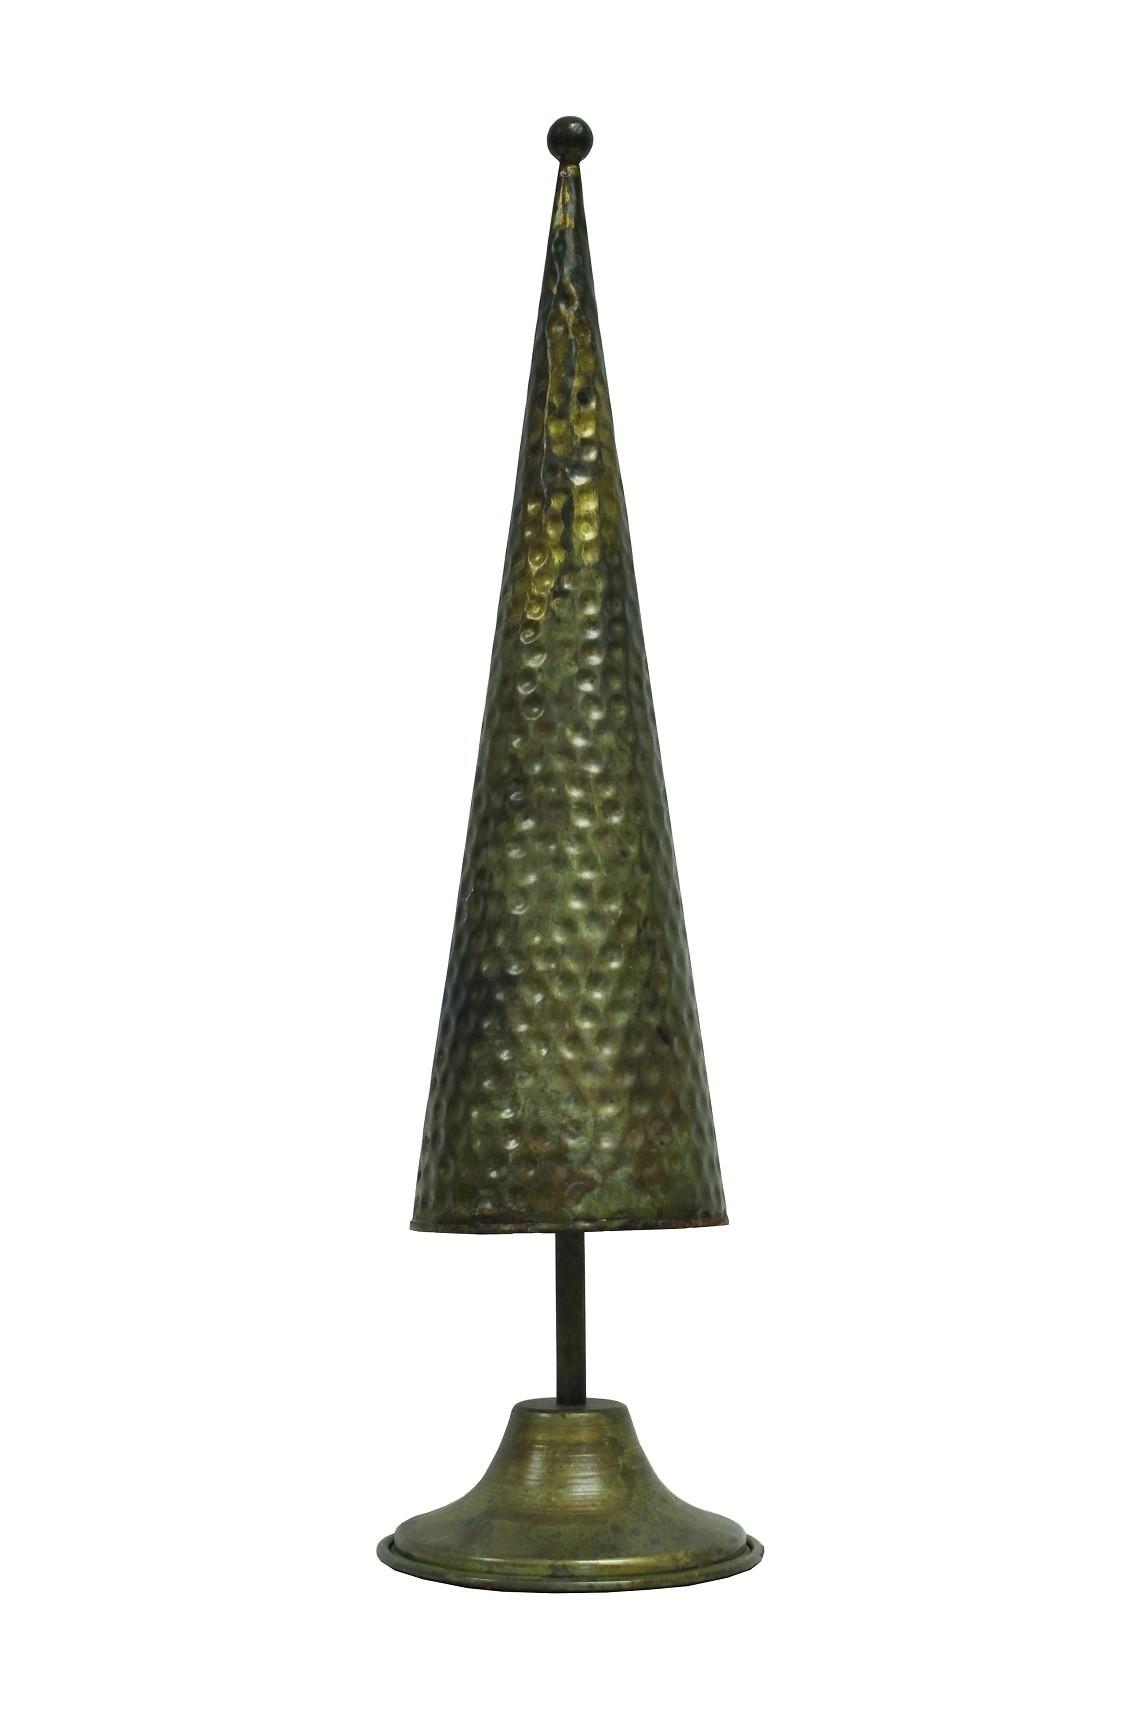 Deko Tannenbaum Kegel Optik grün-gold klein